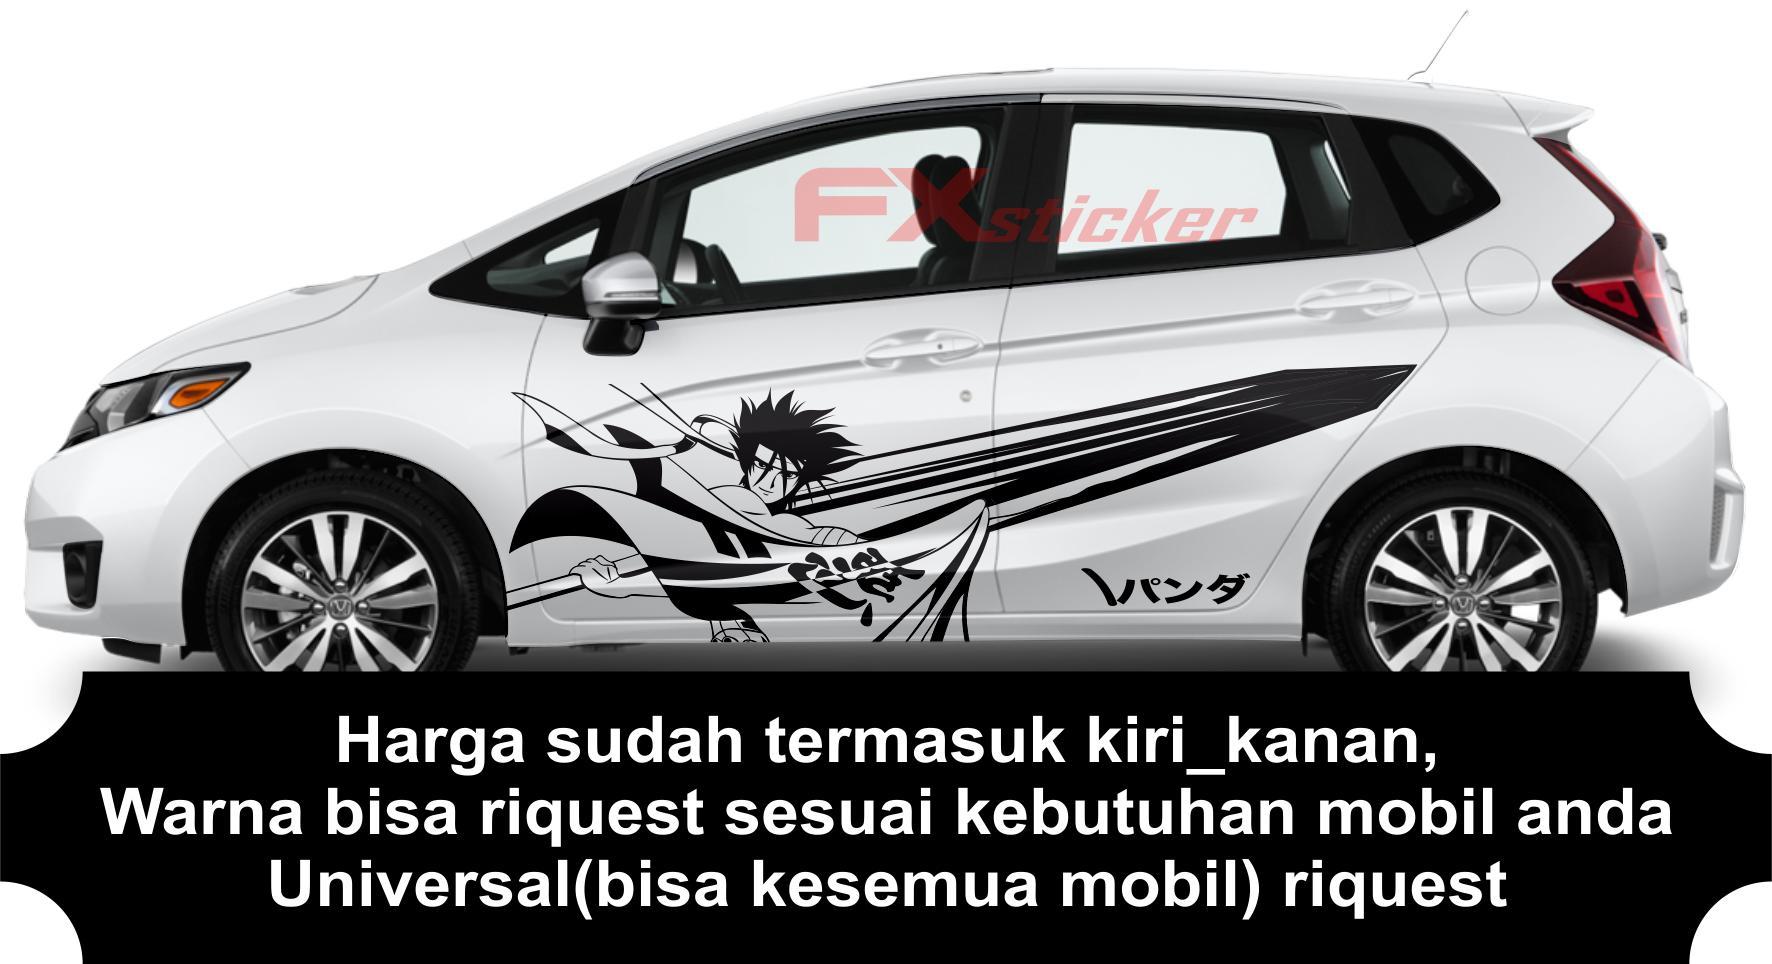 Stiker Termurah Stiker Mobil Cutting Sticker Striping Animasi Samurai Cocok Kesemua Mobil Compatible All Car Lazada Indonesia